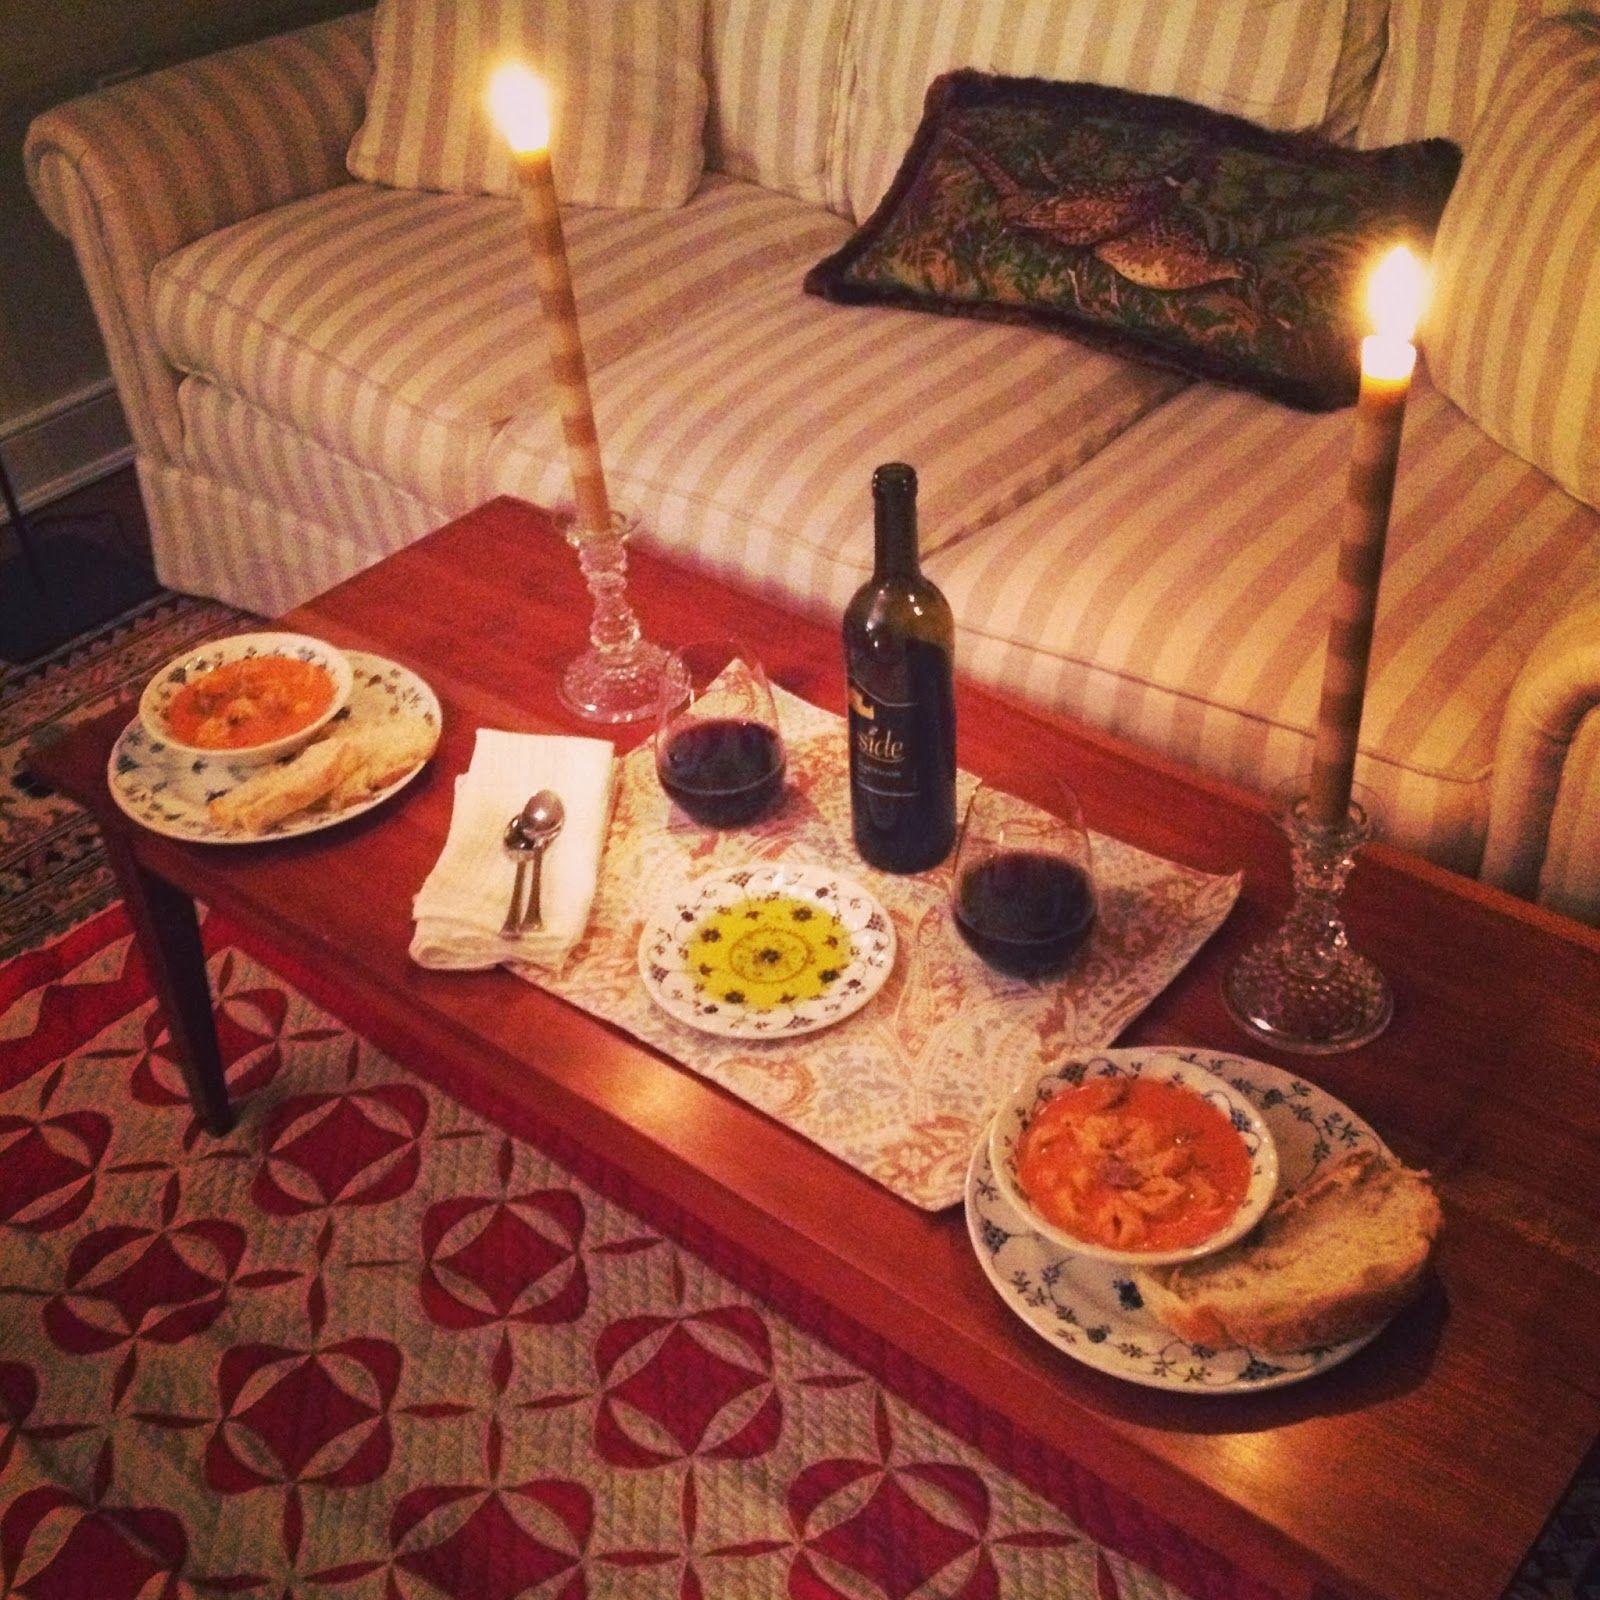 Romantic Dinner At Home On Floor Home Decor